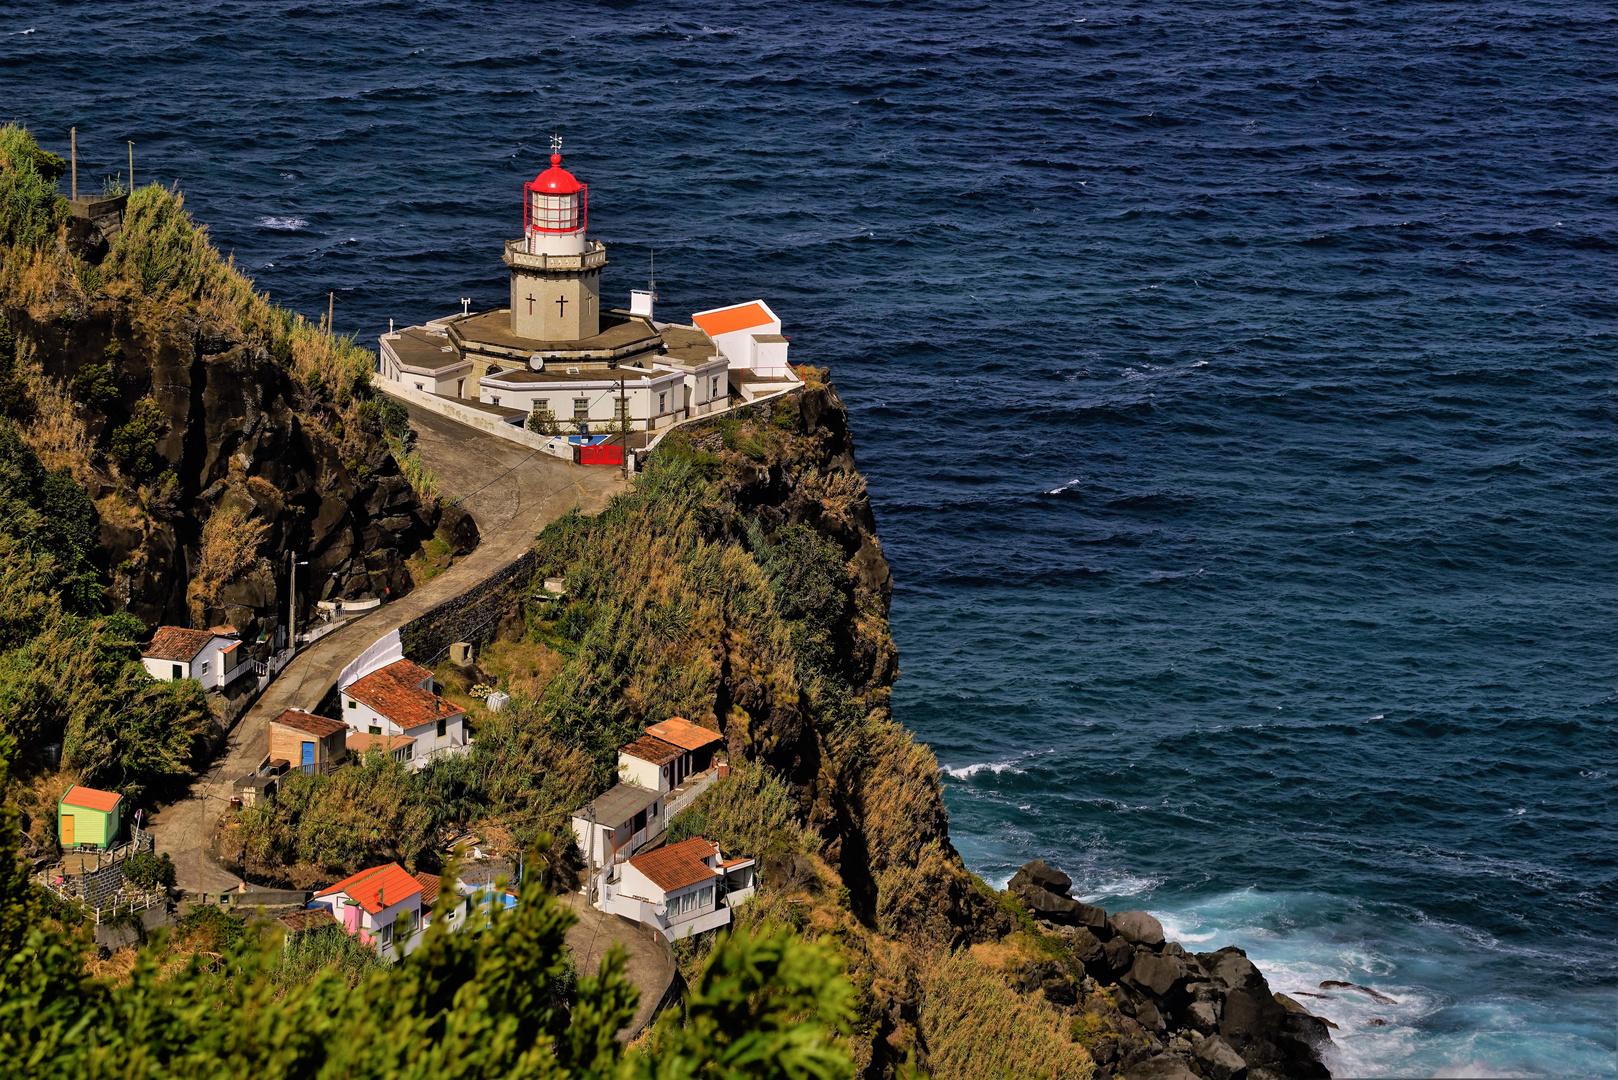 Arnel lighthouse